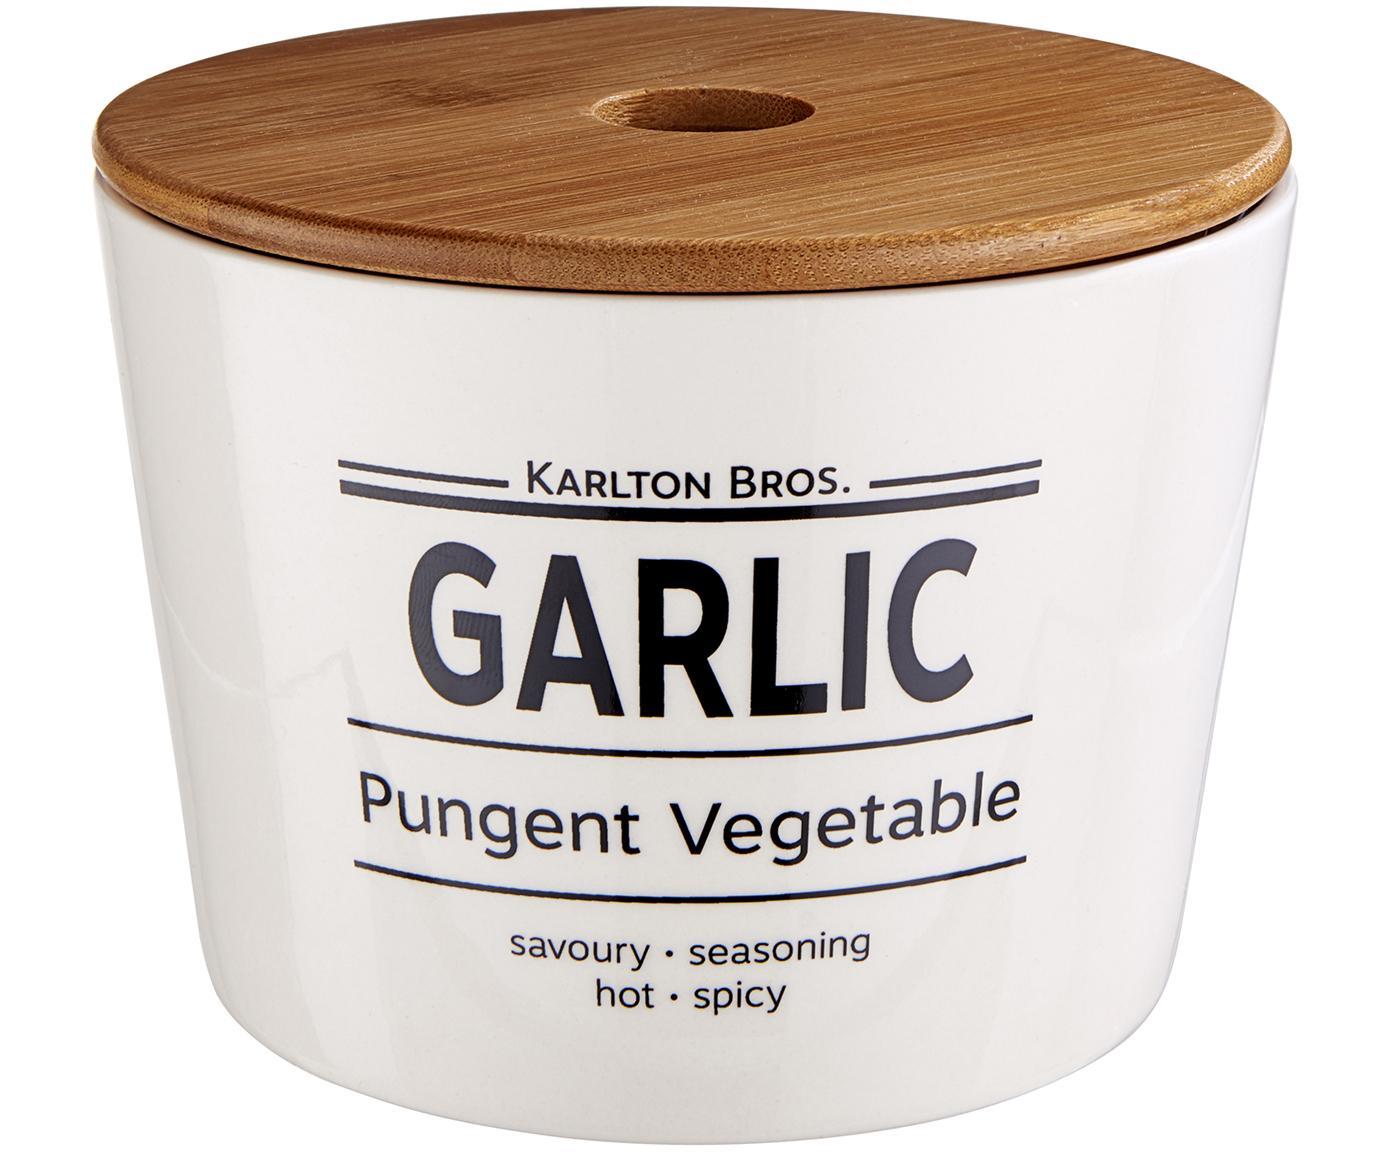 Bote Karlton Bros. Garlic, Porcelana, Blanco, negro, marrón, Ø 14 x Al 11 cm